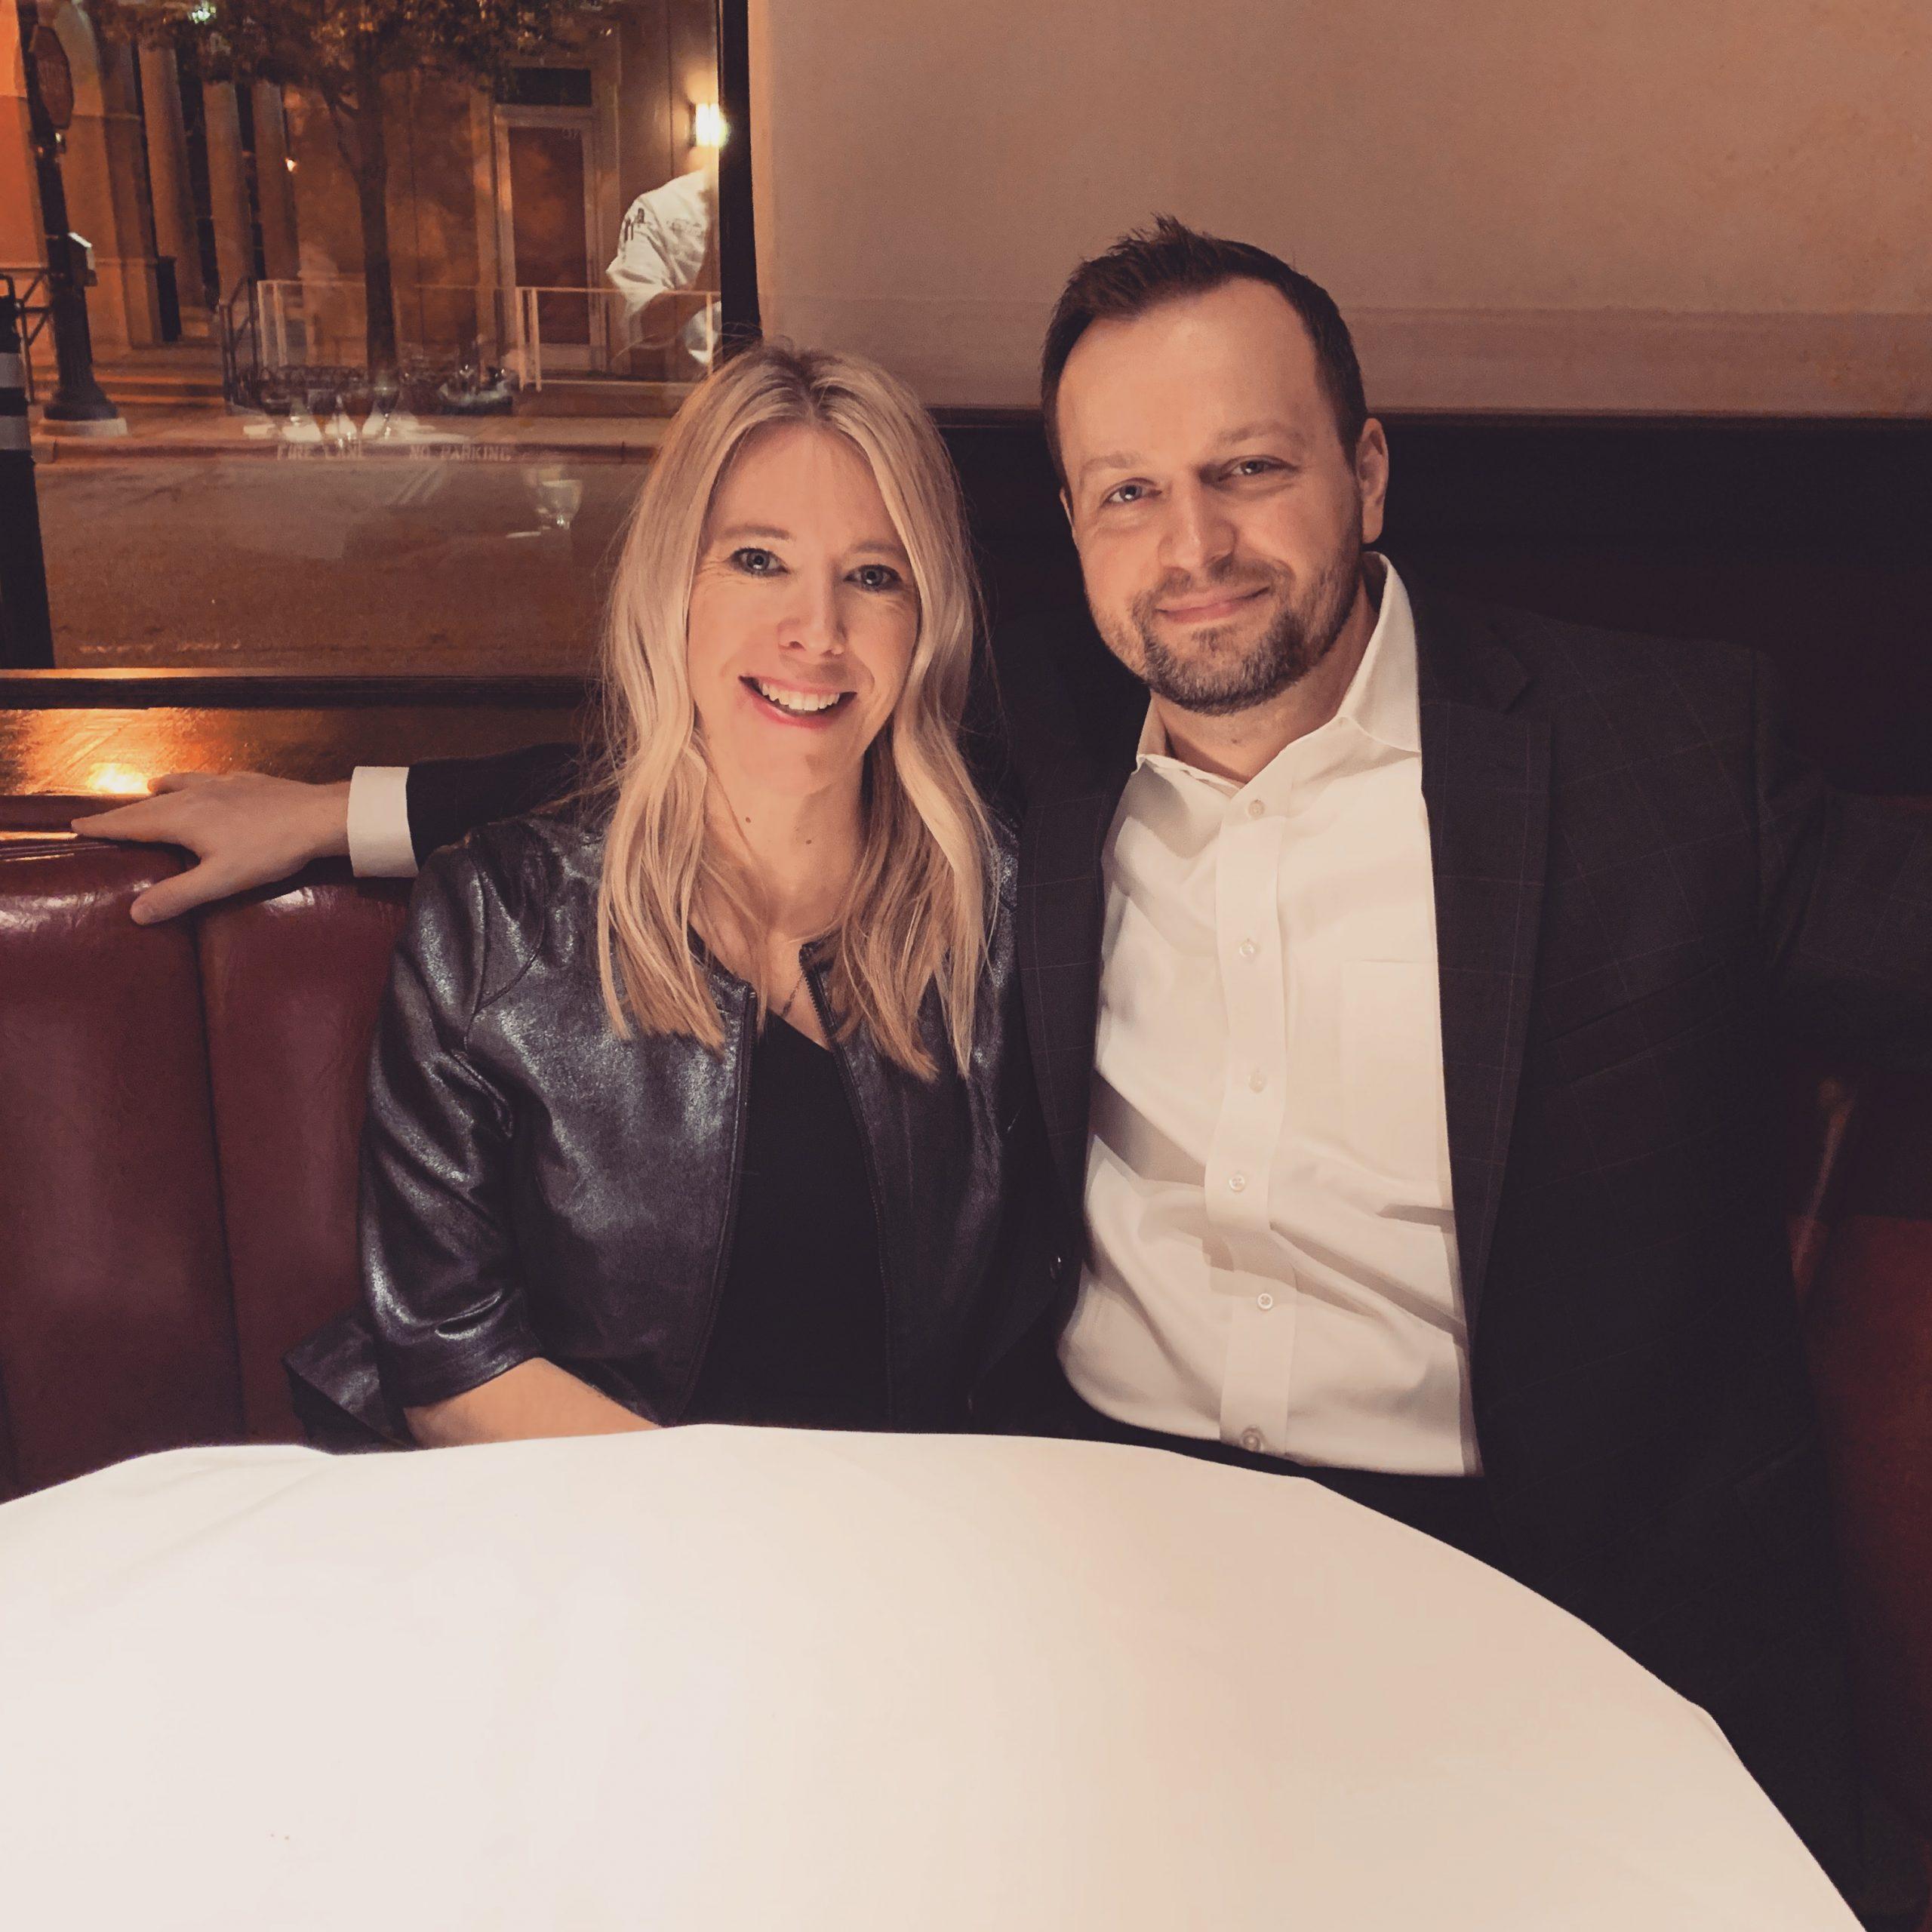 Amanda and Frank Luzsicza